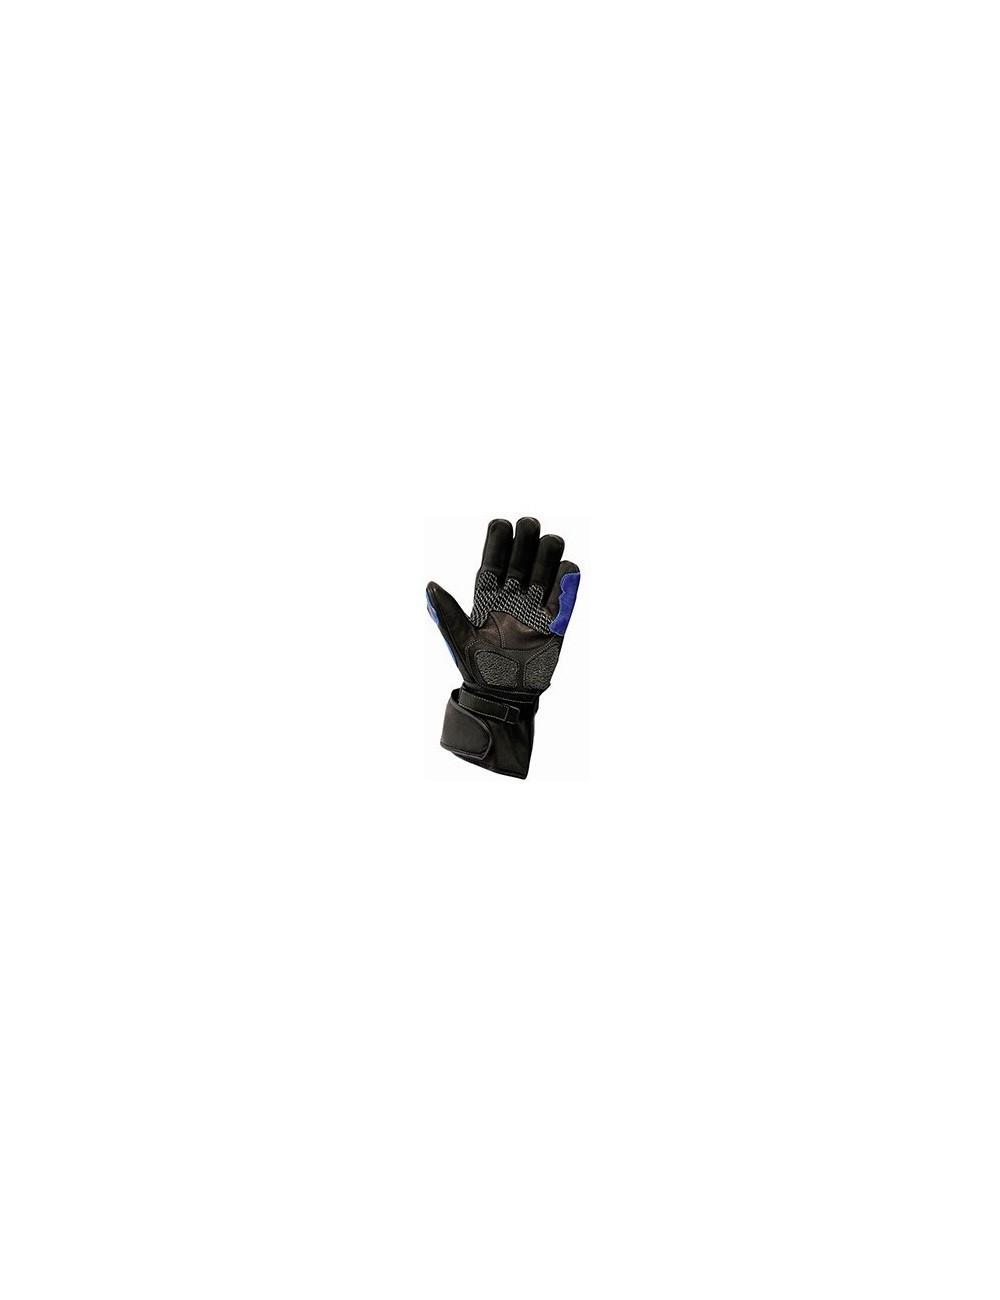 Gants moto cuir - Gants de moto en cuir noir et bleu protections carbone